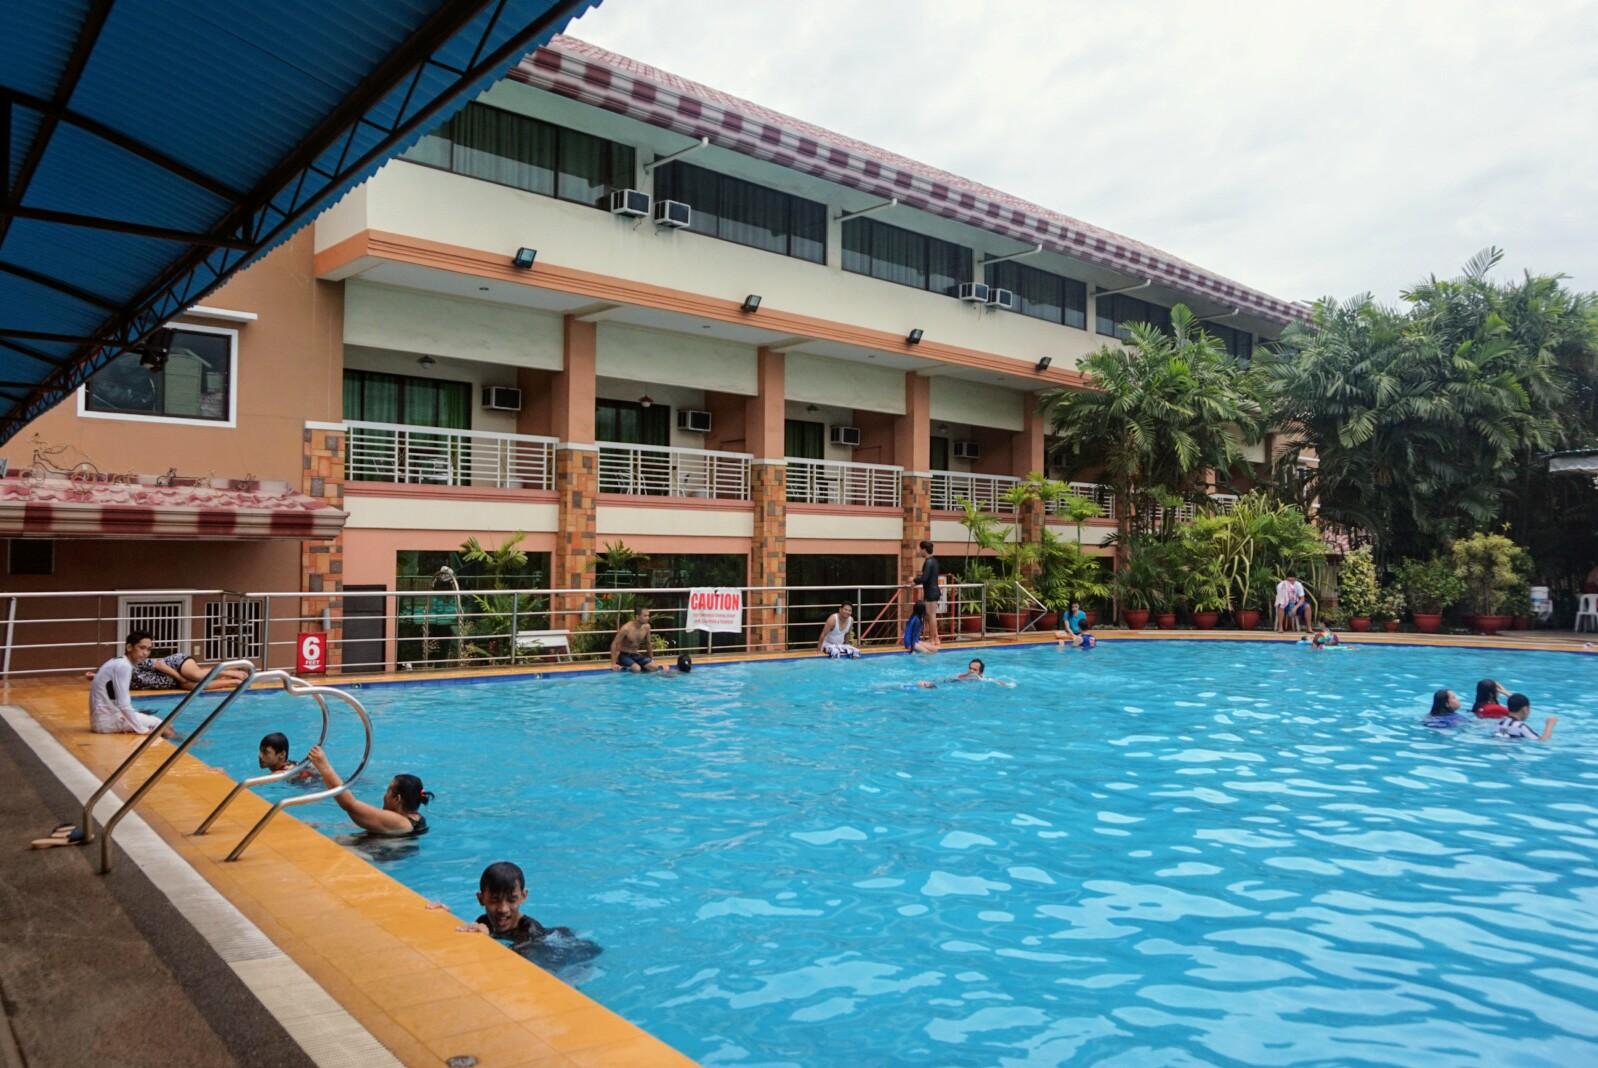 https://tourism.davaocity.gov.ph/wp-content/uploads/2018/10/ea39bc_6738f4c9d45e4c66b955a736408a1c9e_mv2-1.jpg